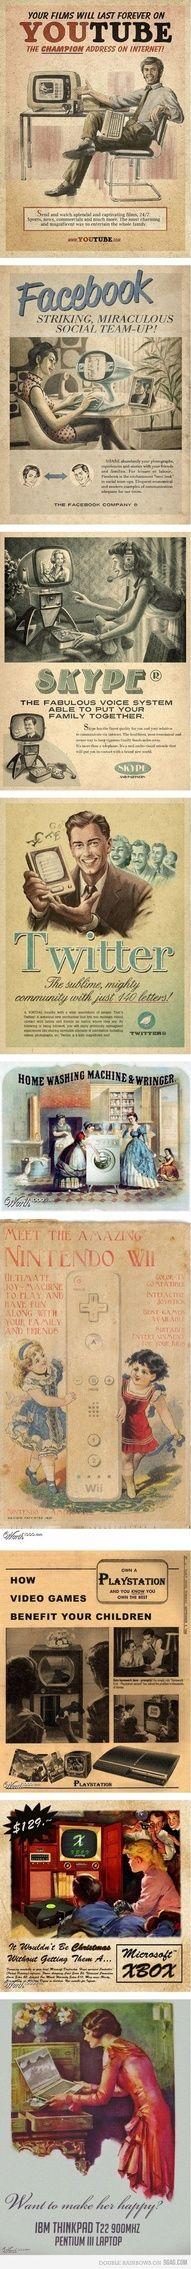 Vintage Makeover Advertisement - New Media Vs. Old Media Retro Ads, Vintage Advertisements, Vintage Ads, Vintage Posters, Retro Advertising, School Advertising, Vintage Style, Product Advertising, 1940s Style